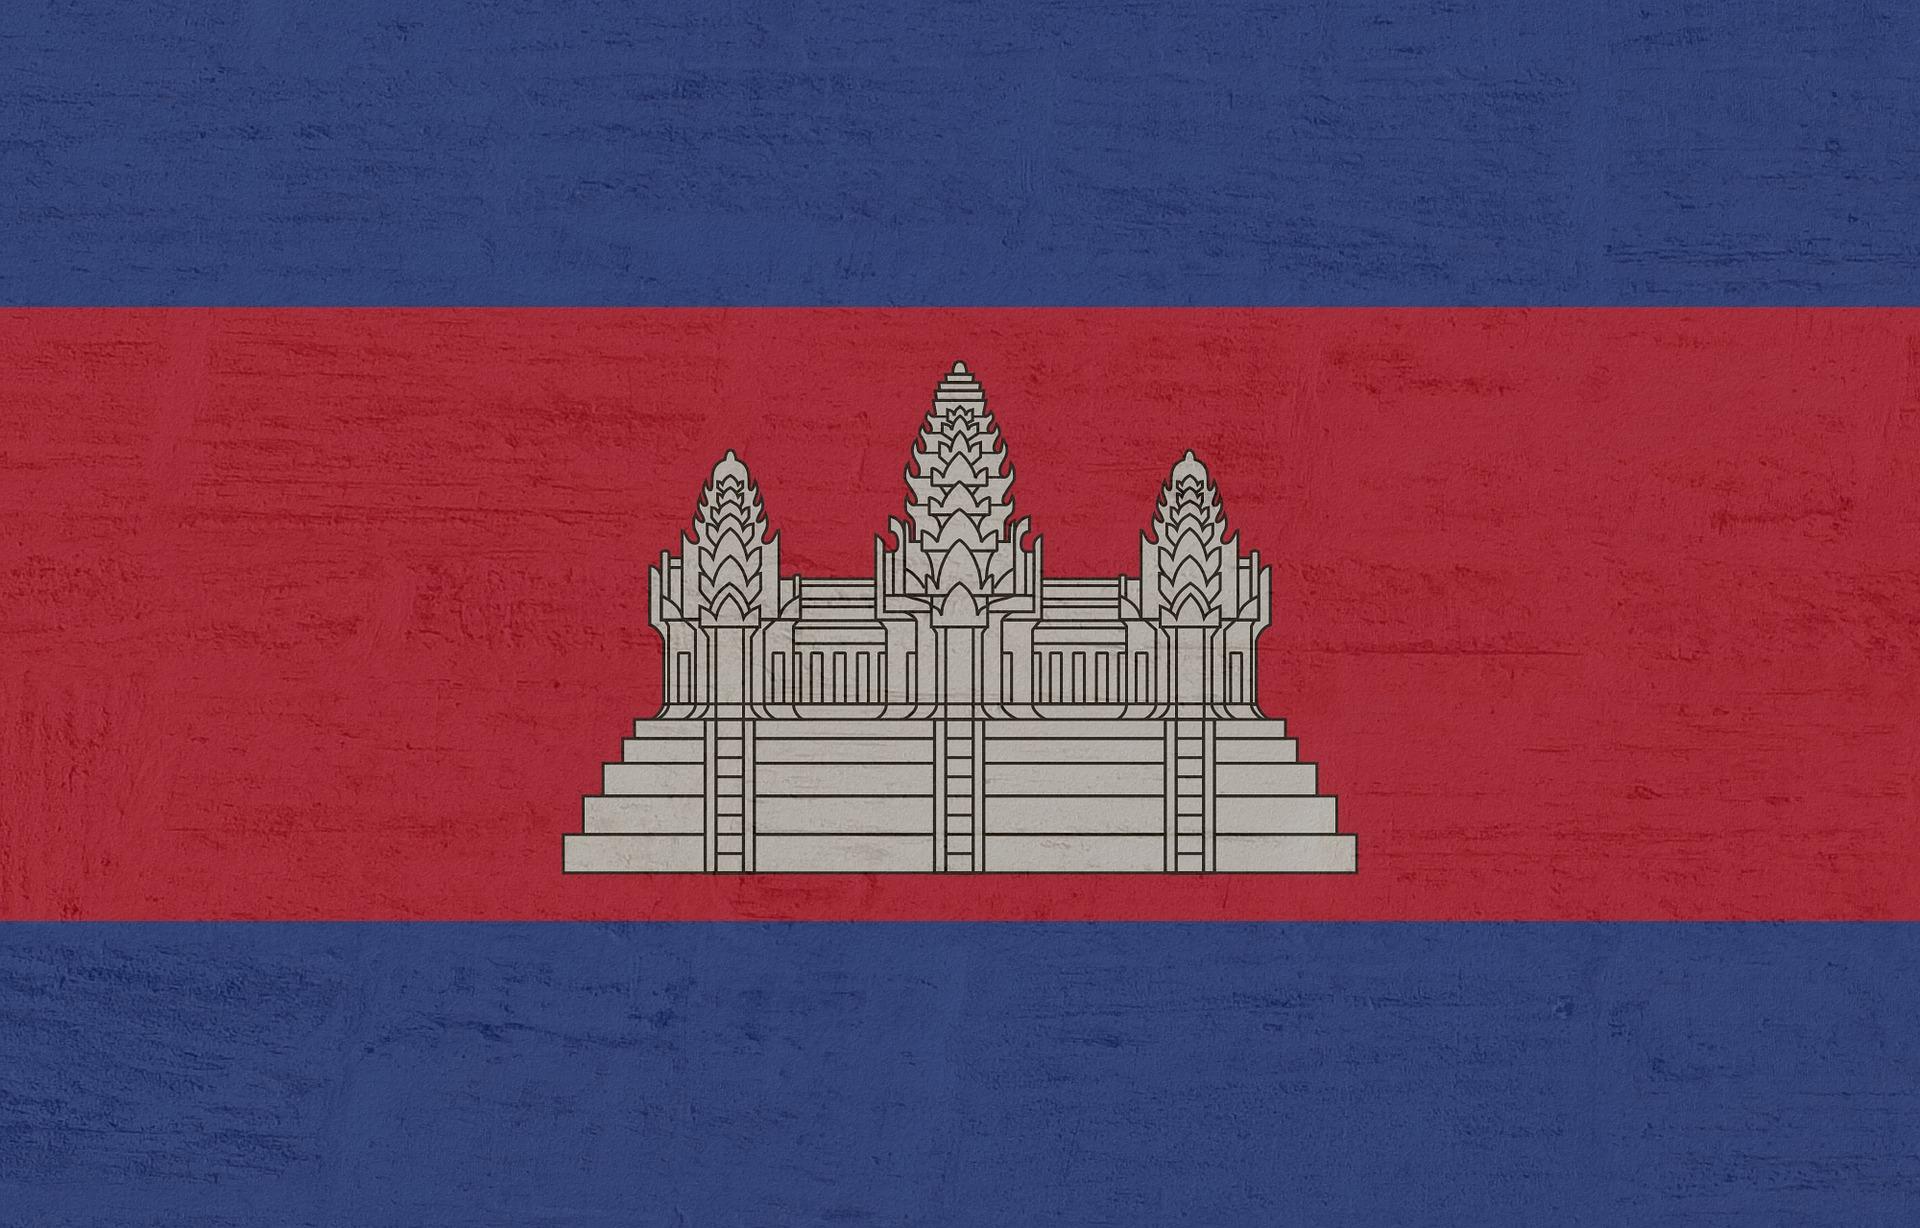 Trademark registration Cambodia